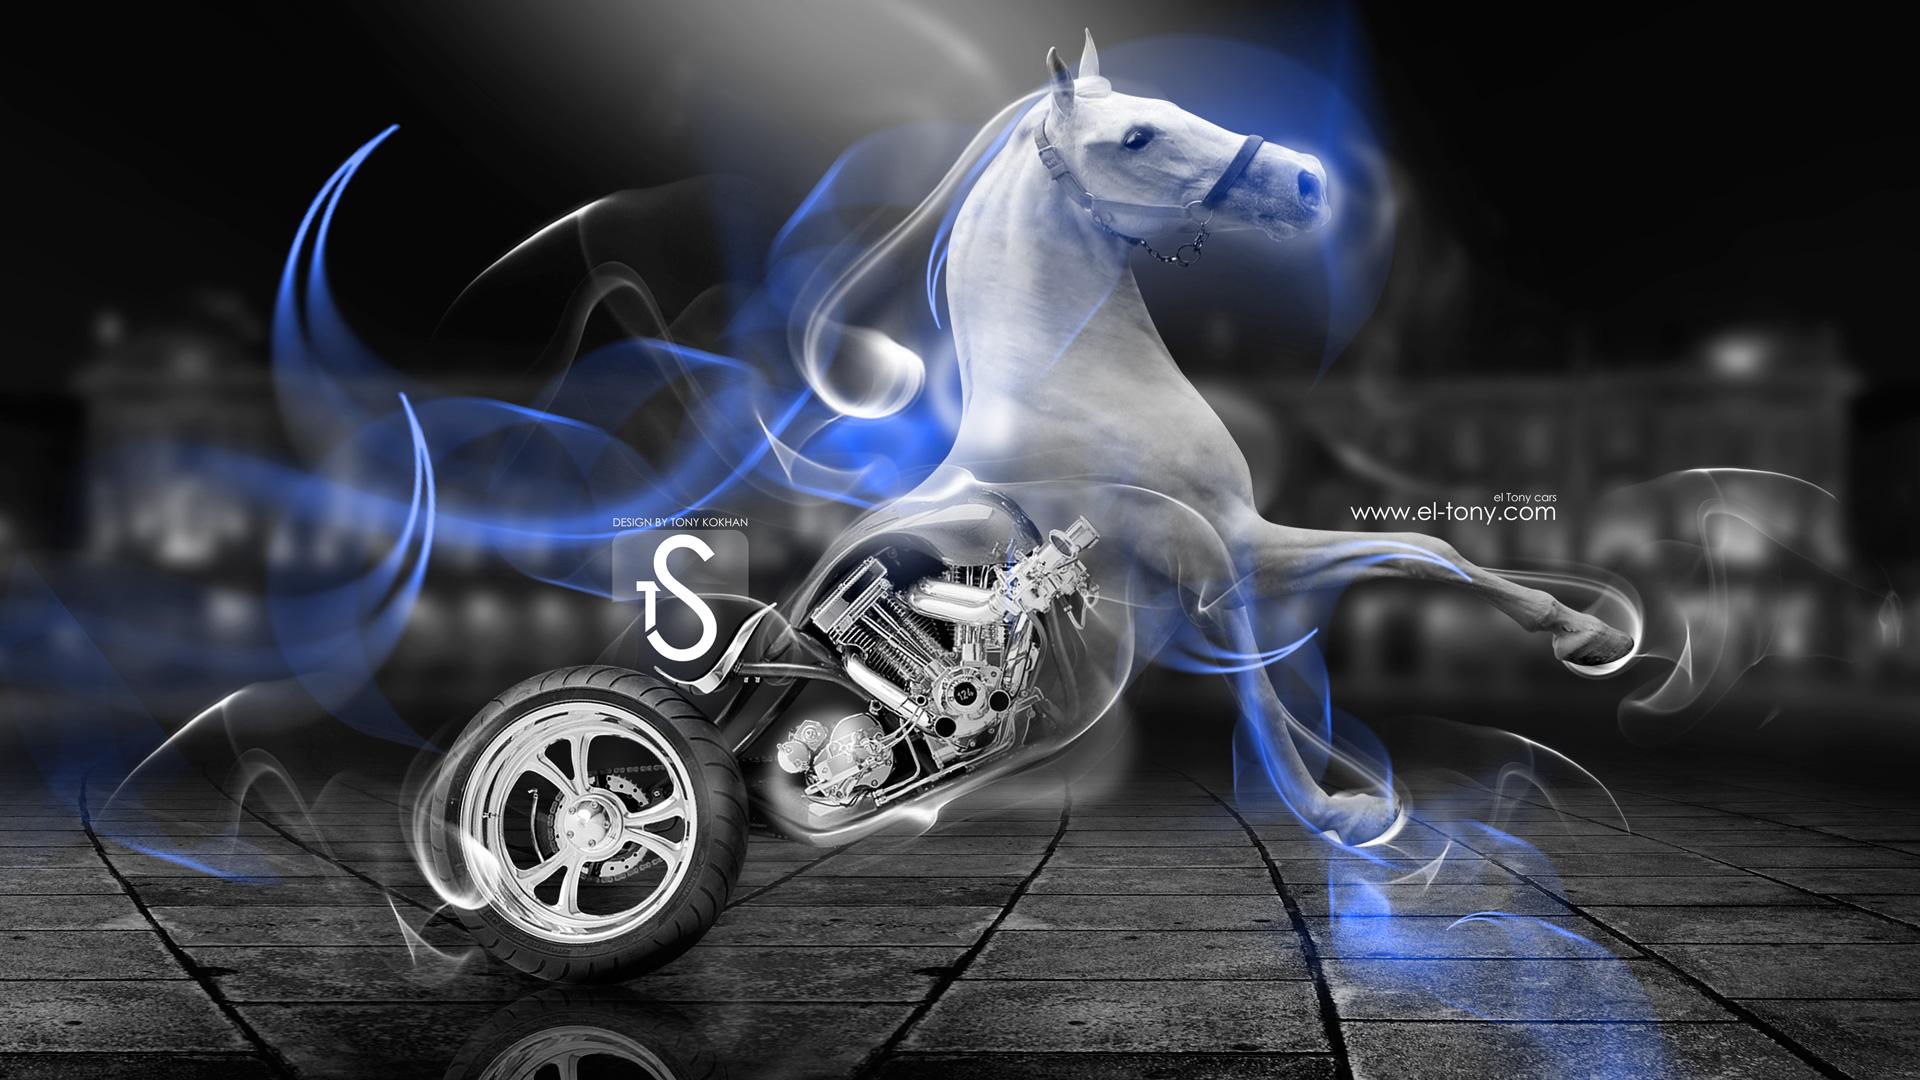 Fire Moto Horse 2014 Hd Wallpapers Design By Tony Kokhan El Tony 1920x1080